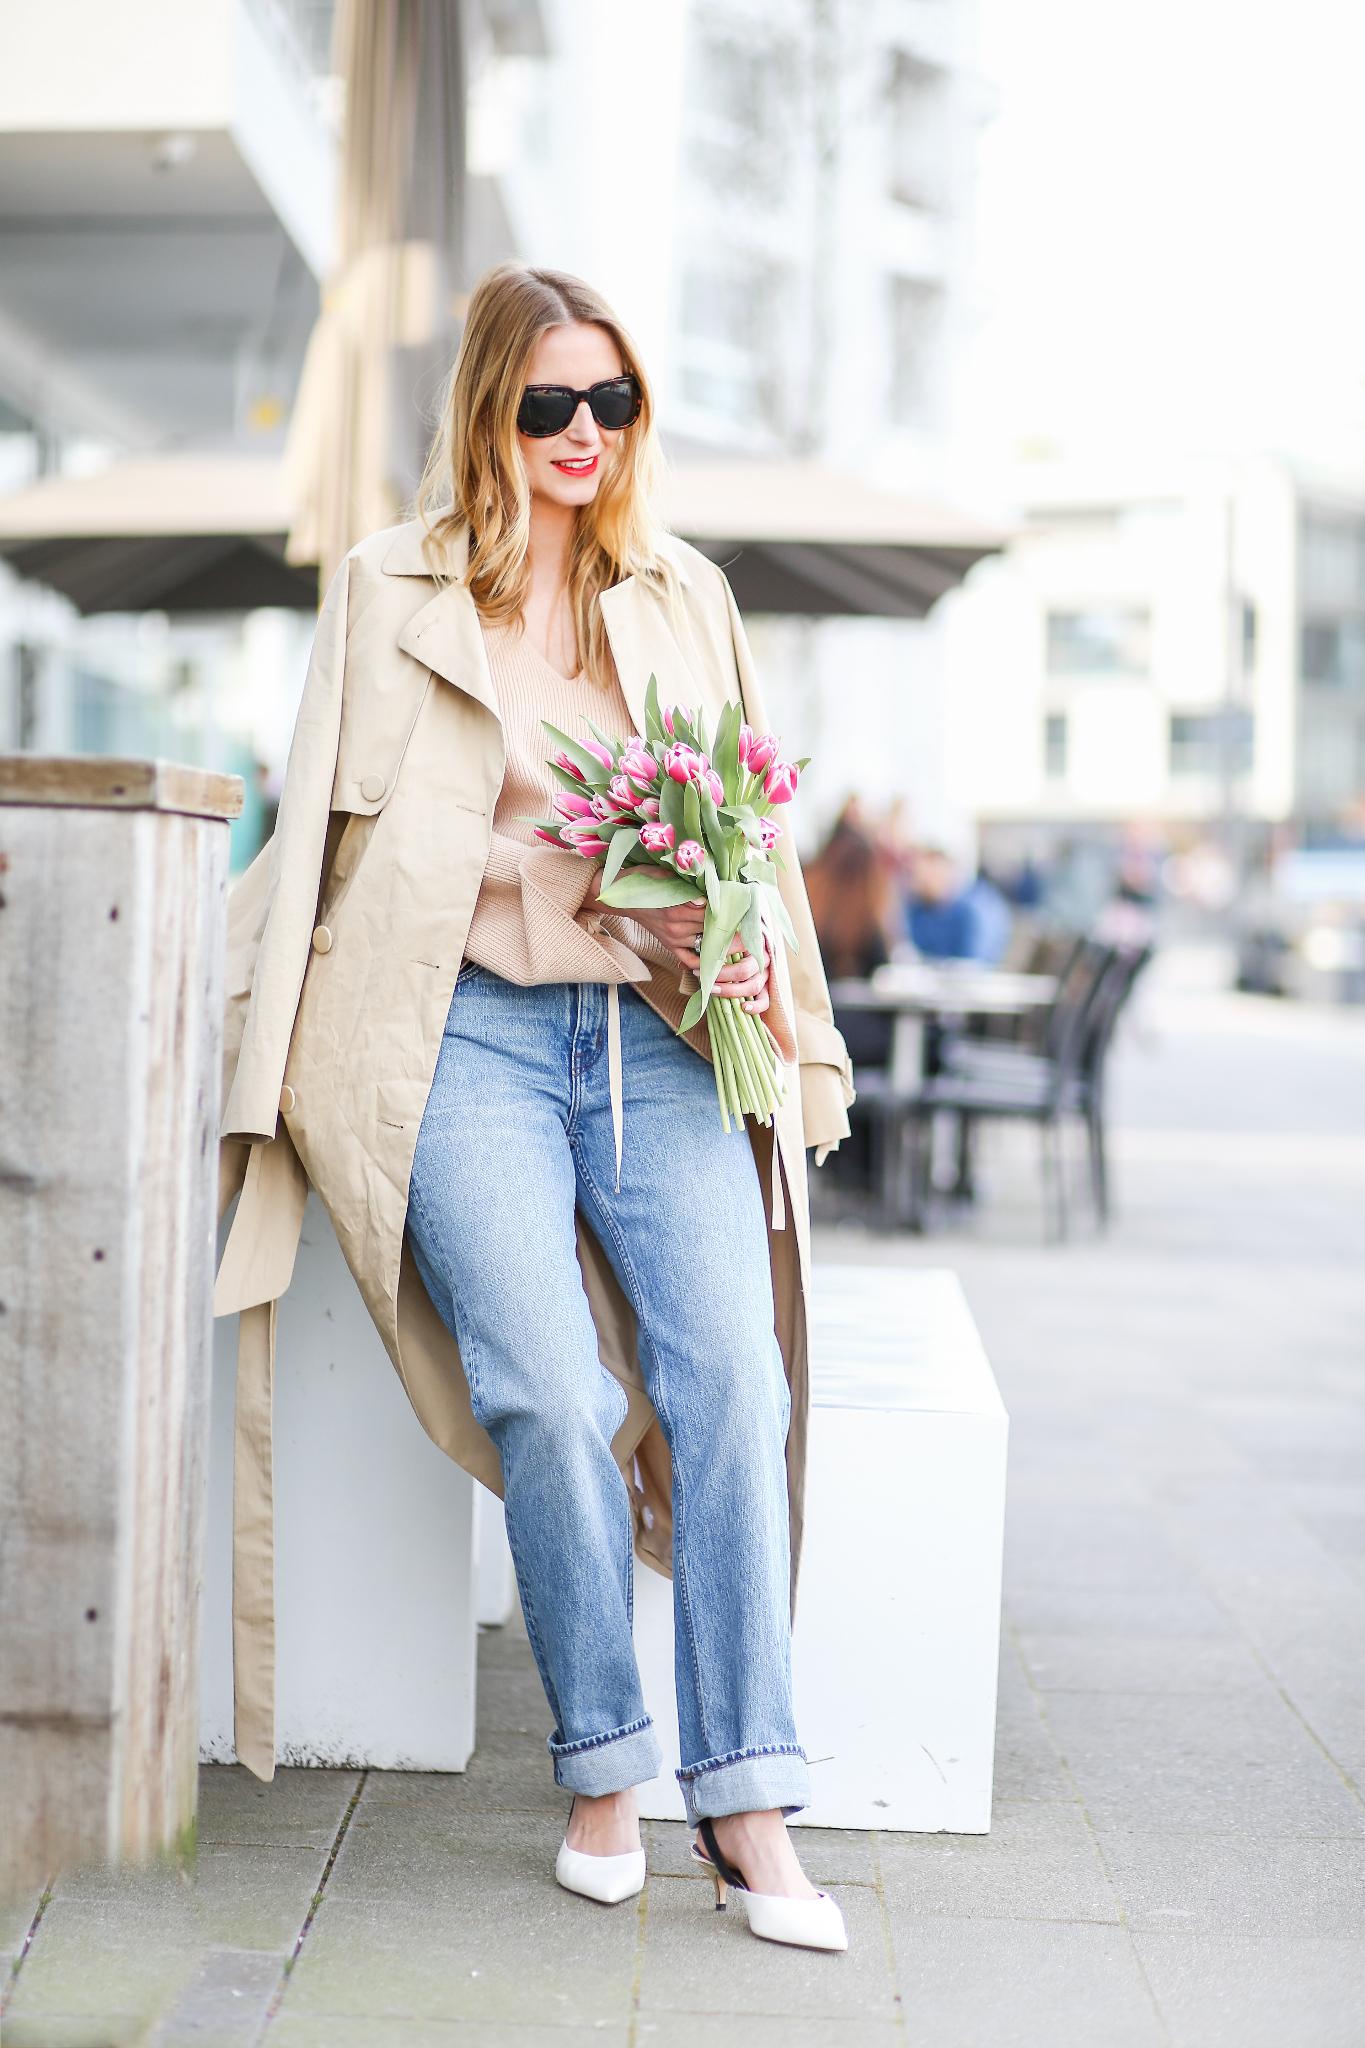 MOD-by-Monique-Fashion-Looks-Casual-Denim-2